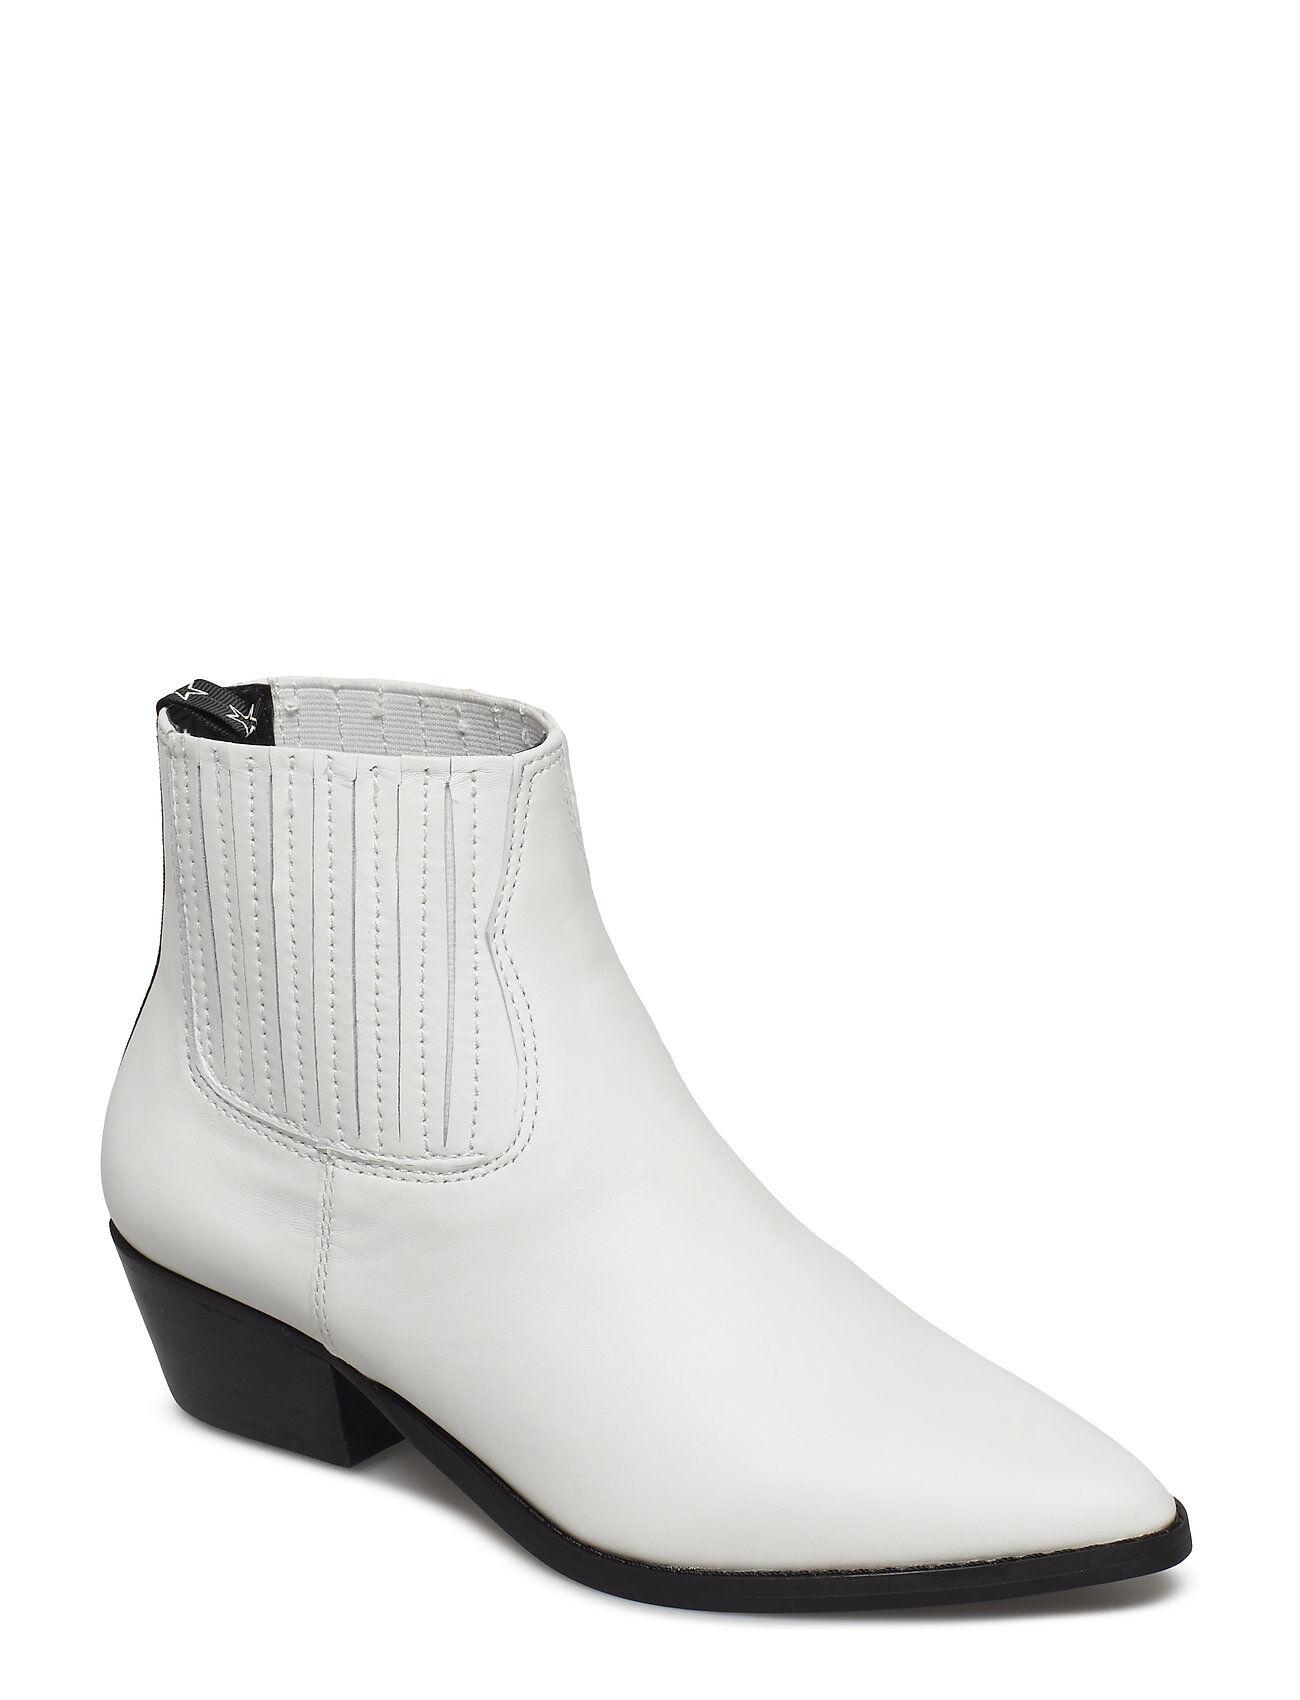 Steve Madden Westie Ankle Boot